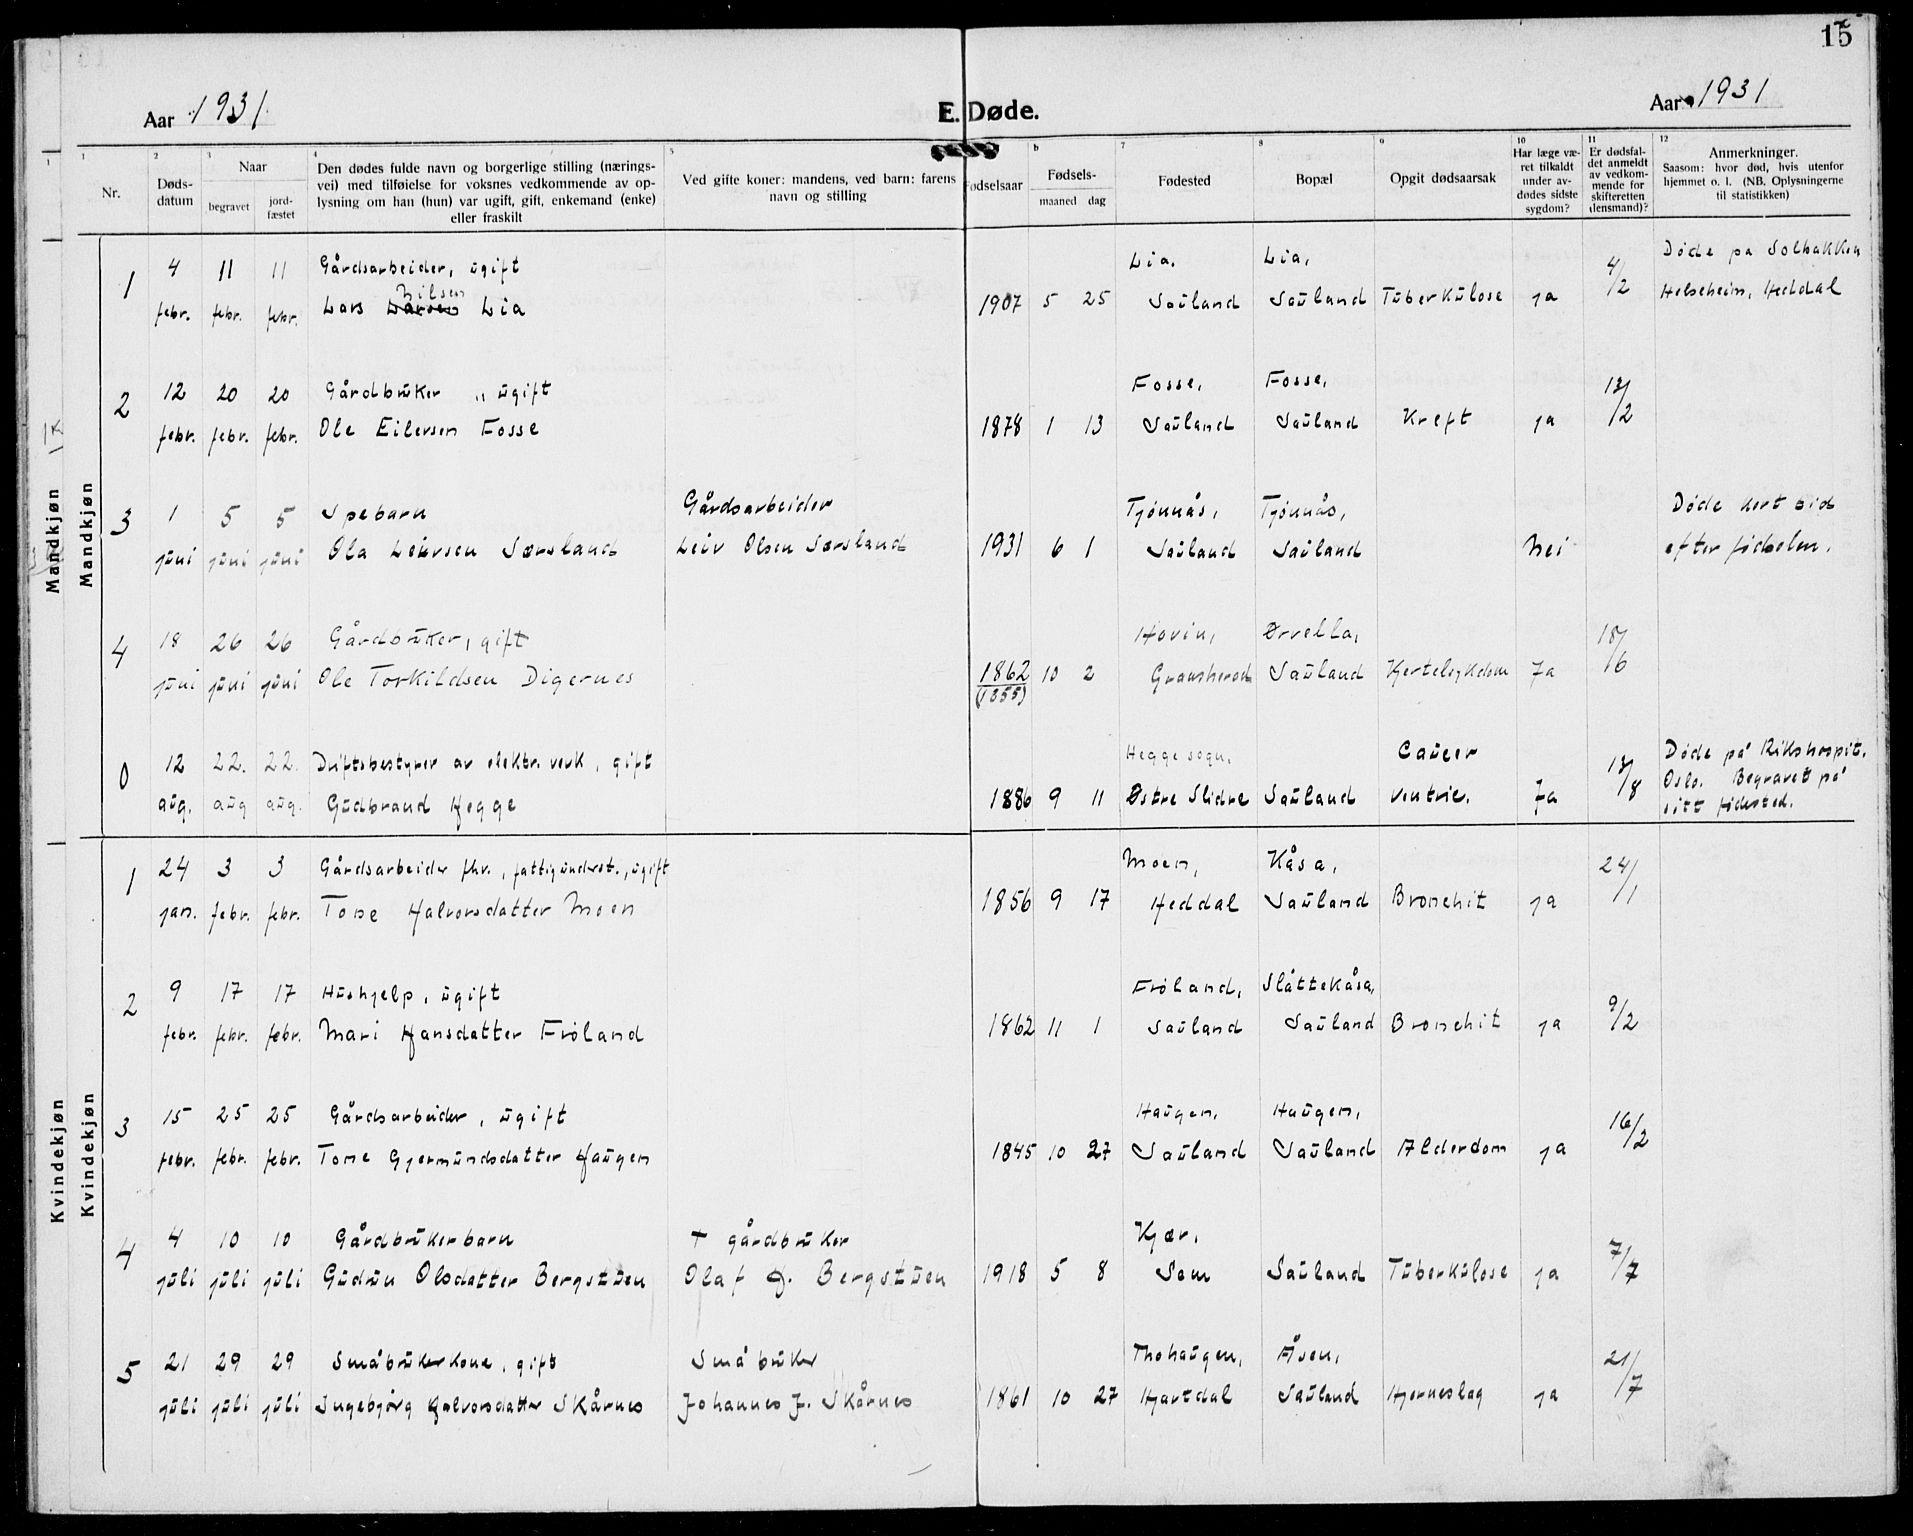 SAKO, Hjartdal kirkebøker, F/Fb/L0002: Ministerialbok nr. II 2, 1880-1932, s. 15